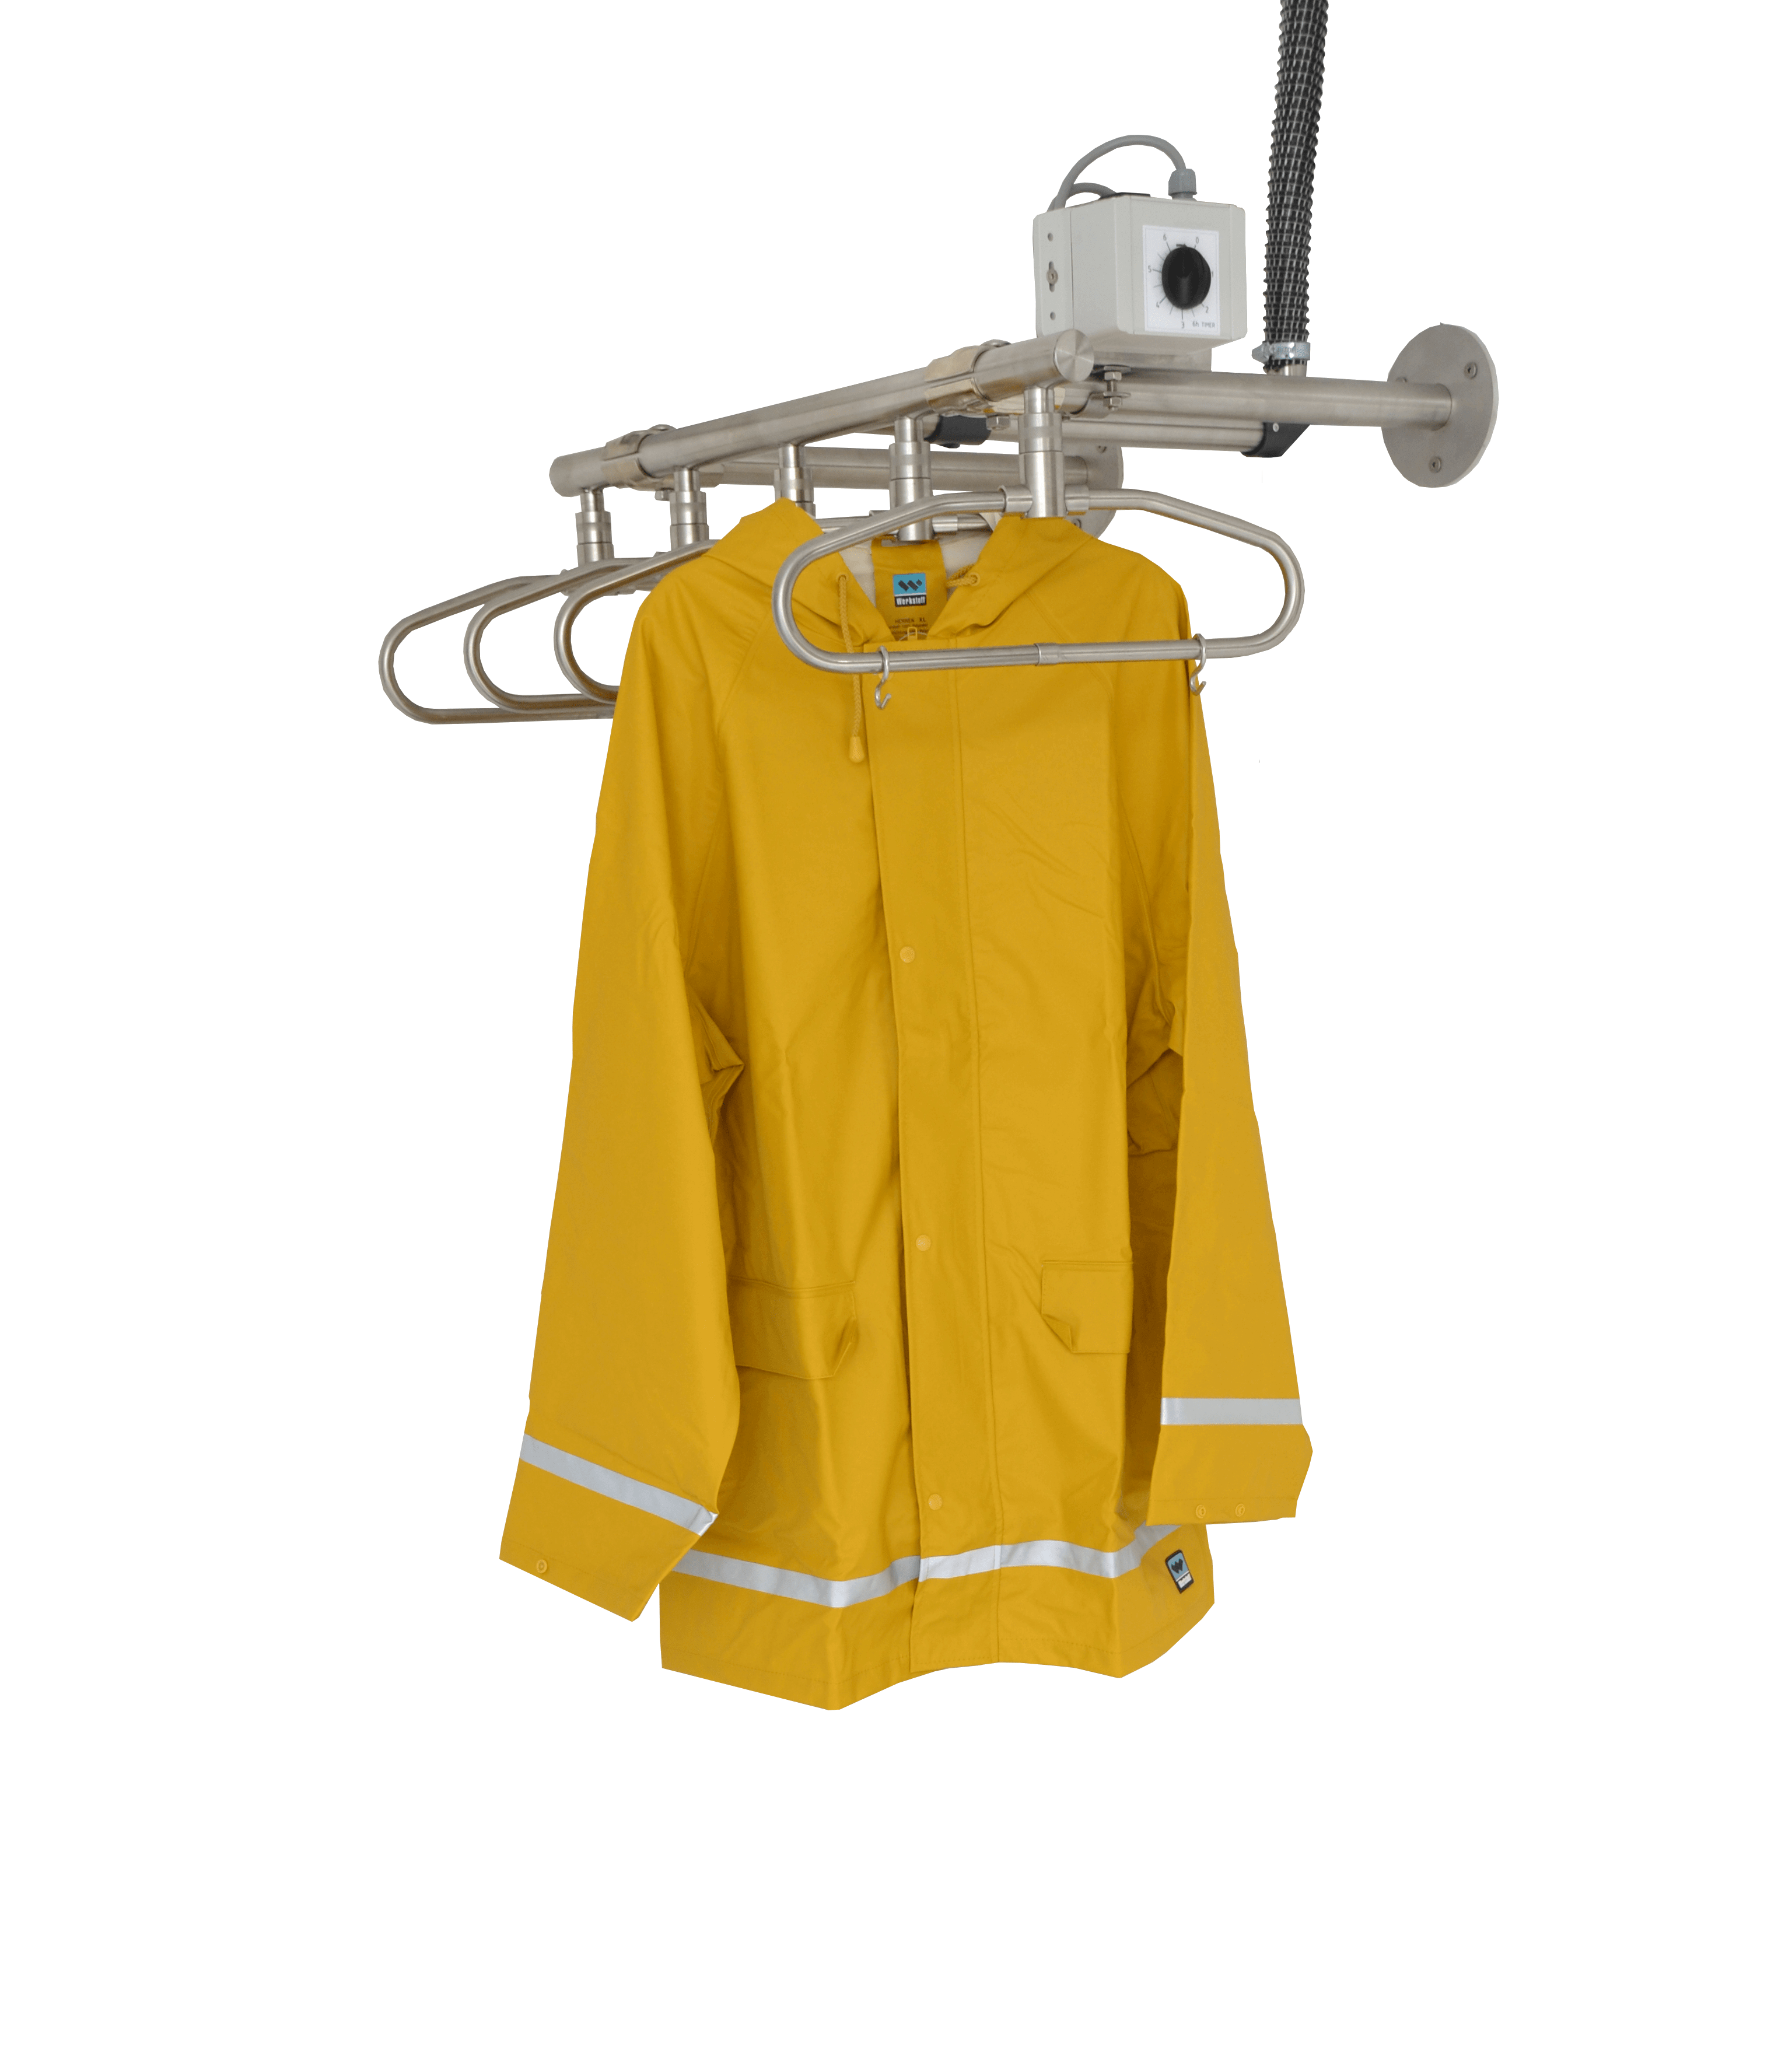 heavy jacket dryer